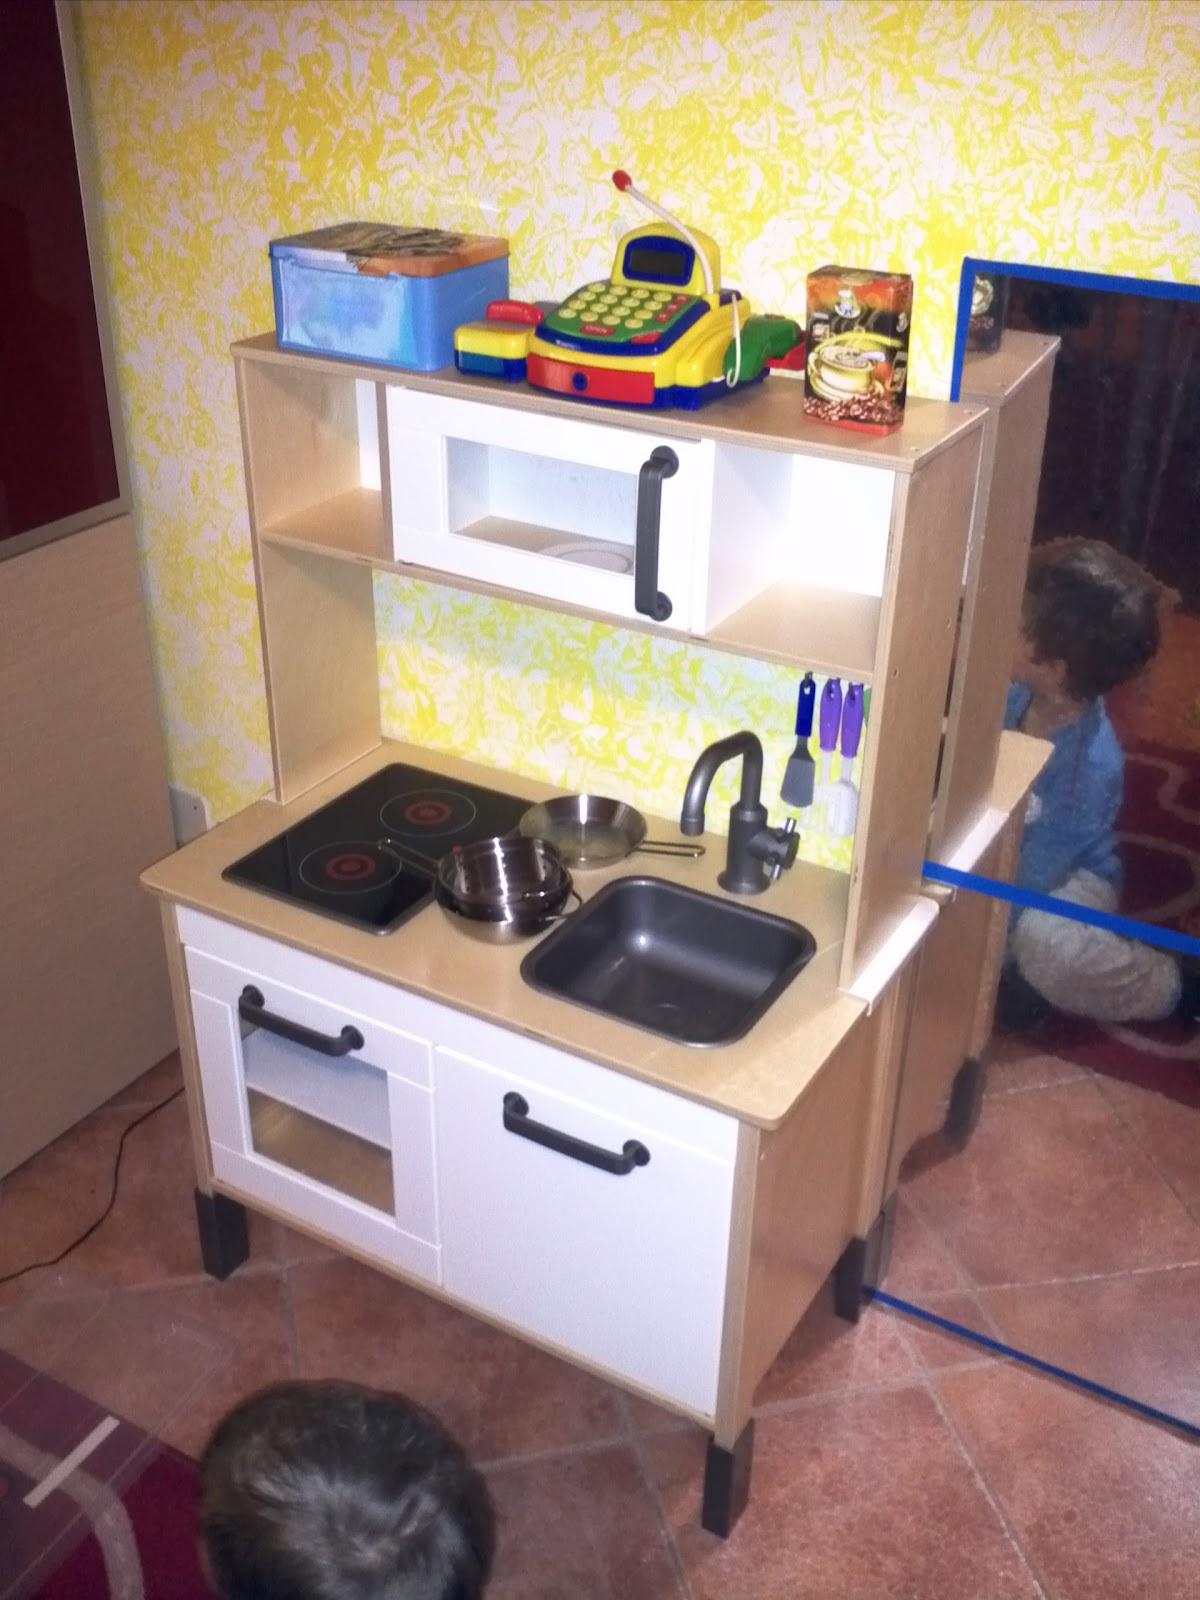 Cucine In Legno Per Bambini Ikea ~ duylinh for